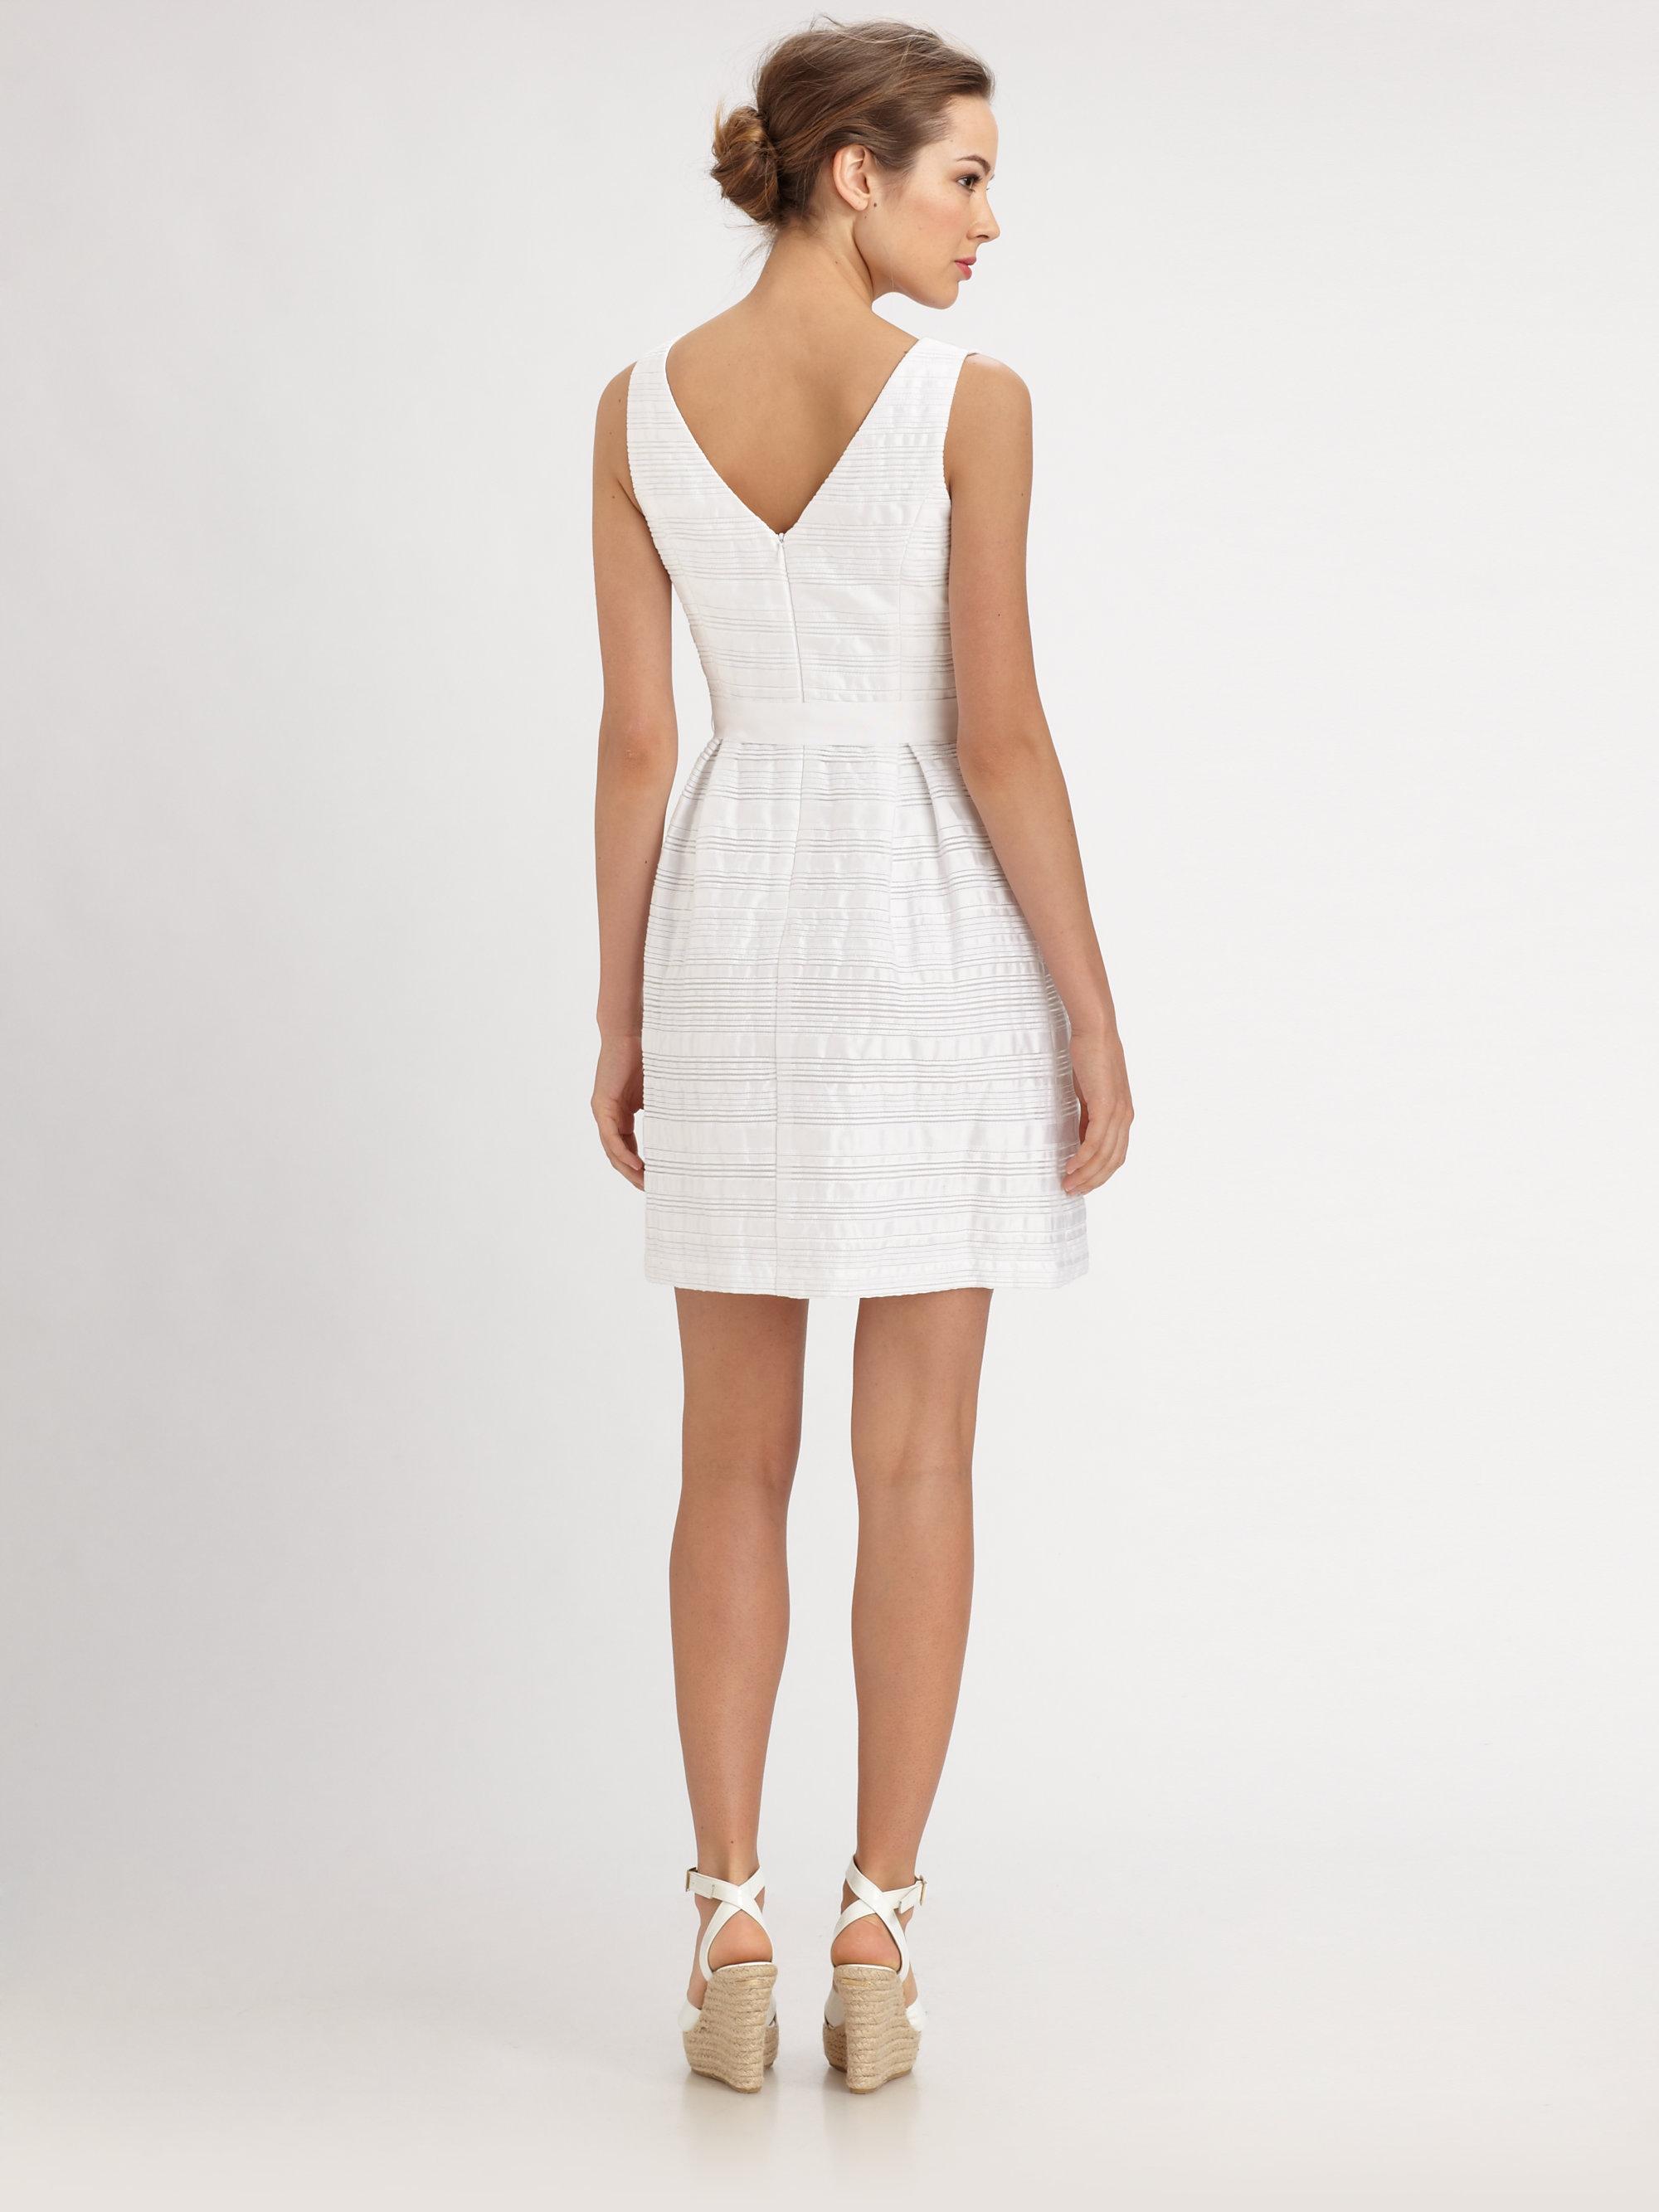 45095eb5425 Trina Turk Fru Fru Dress in White - Lyst